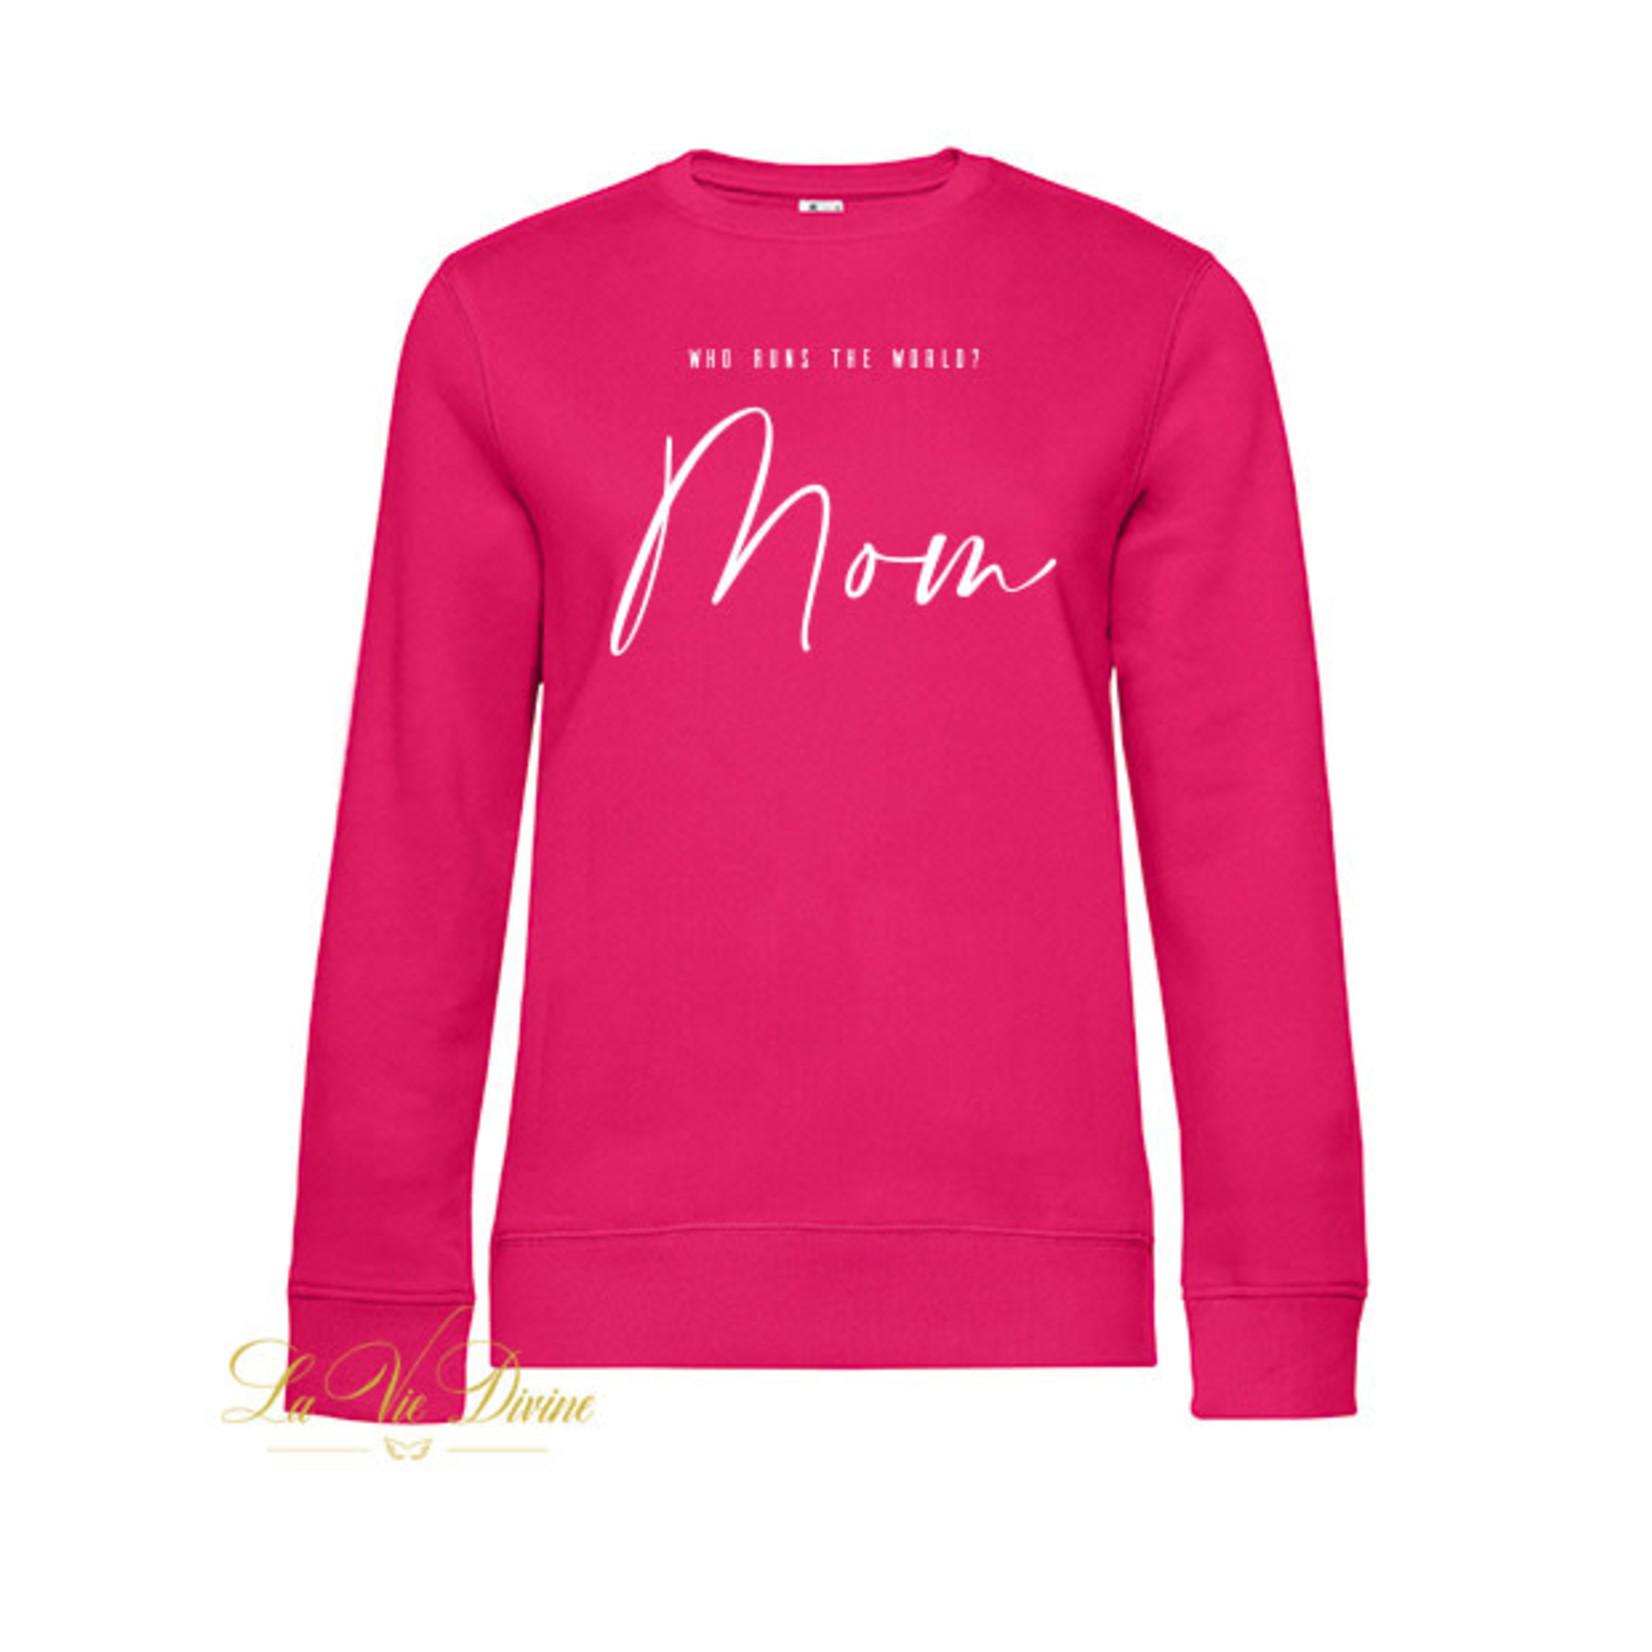 Damessweater 'who runs the world'